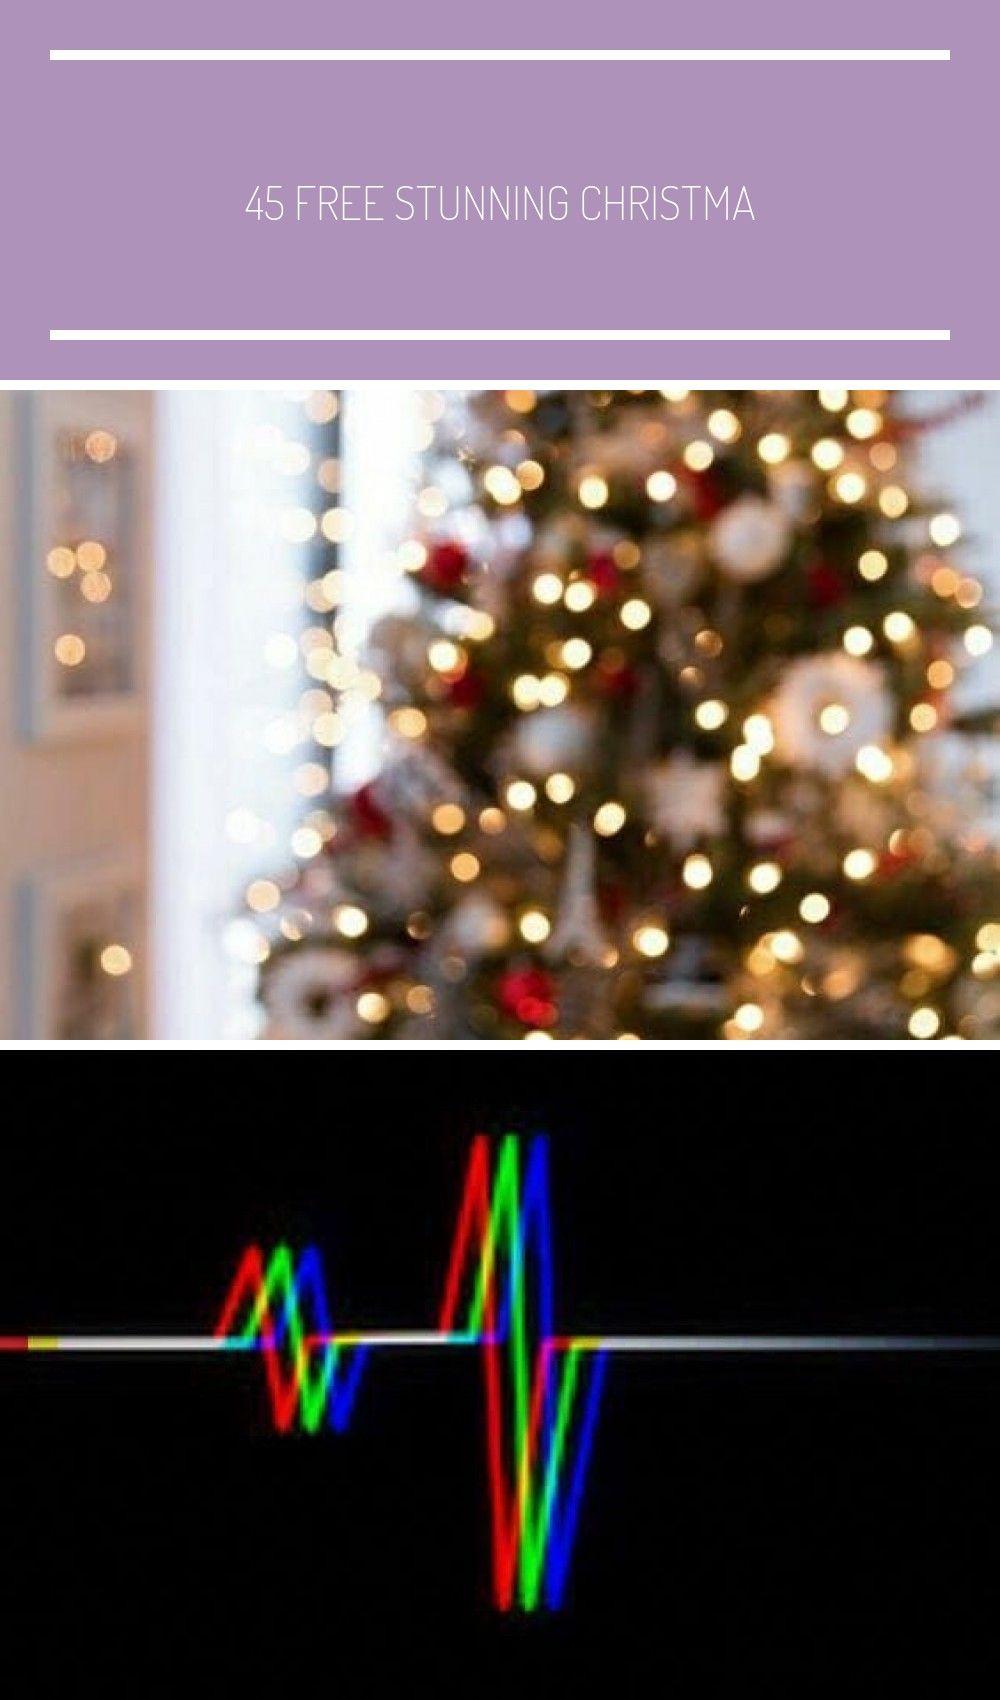 45 Free Stunning Christmas Wallpaper Backgrounds For Iphone Get Cute Christmas A In 2020 Wallpaper Iphone Christmas Christmas Aesthetic Wallpaper Christmas Aesthetic